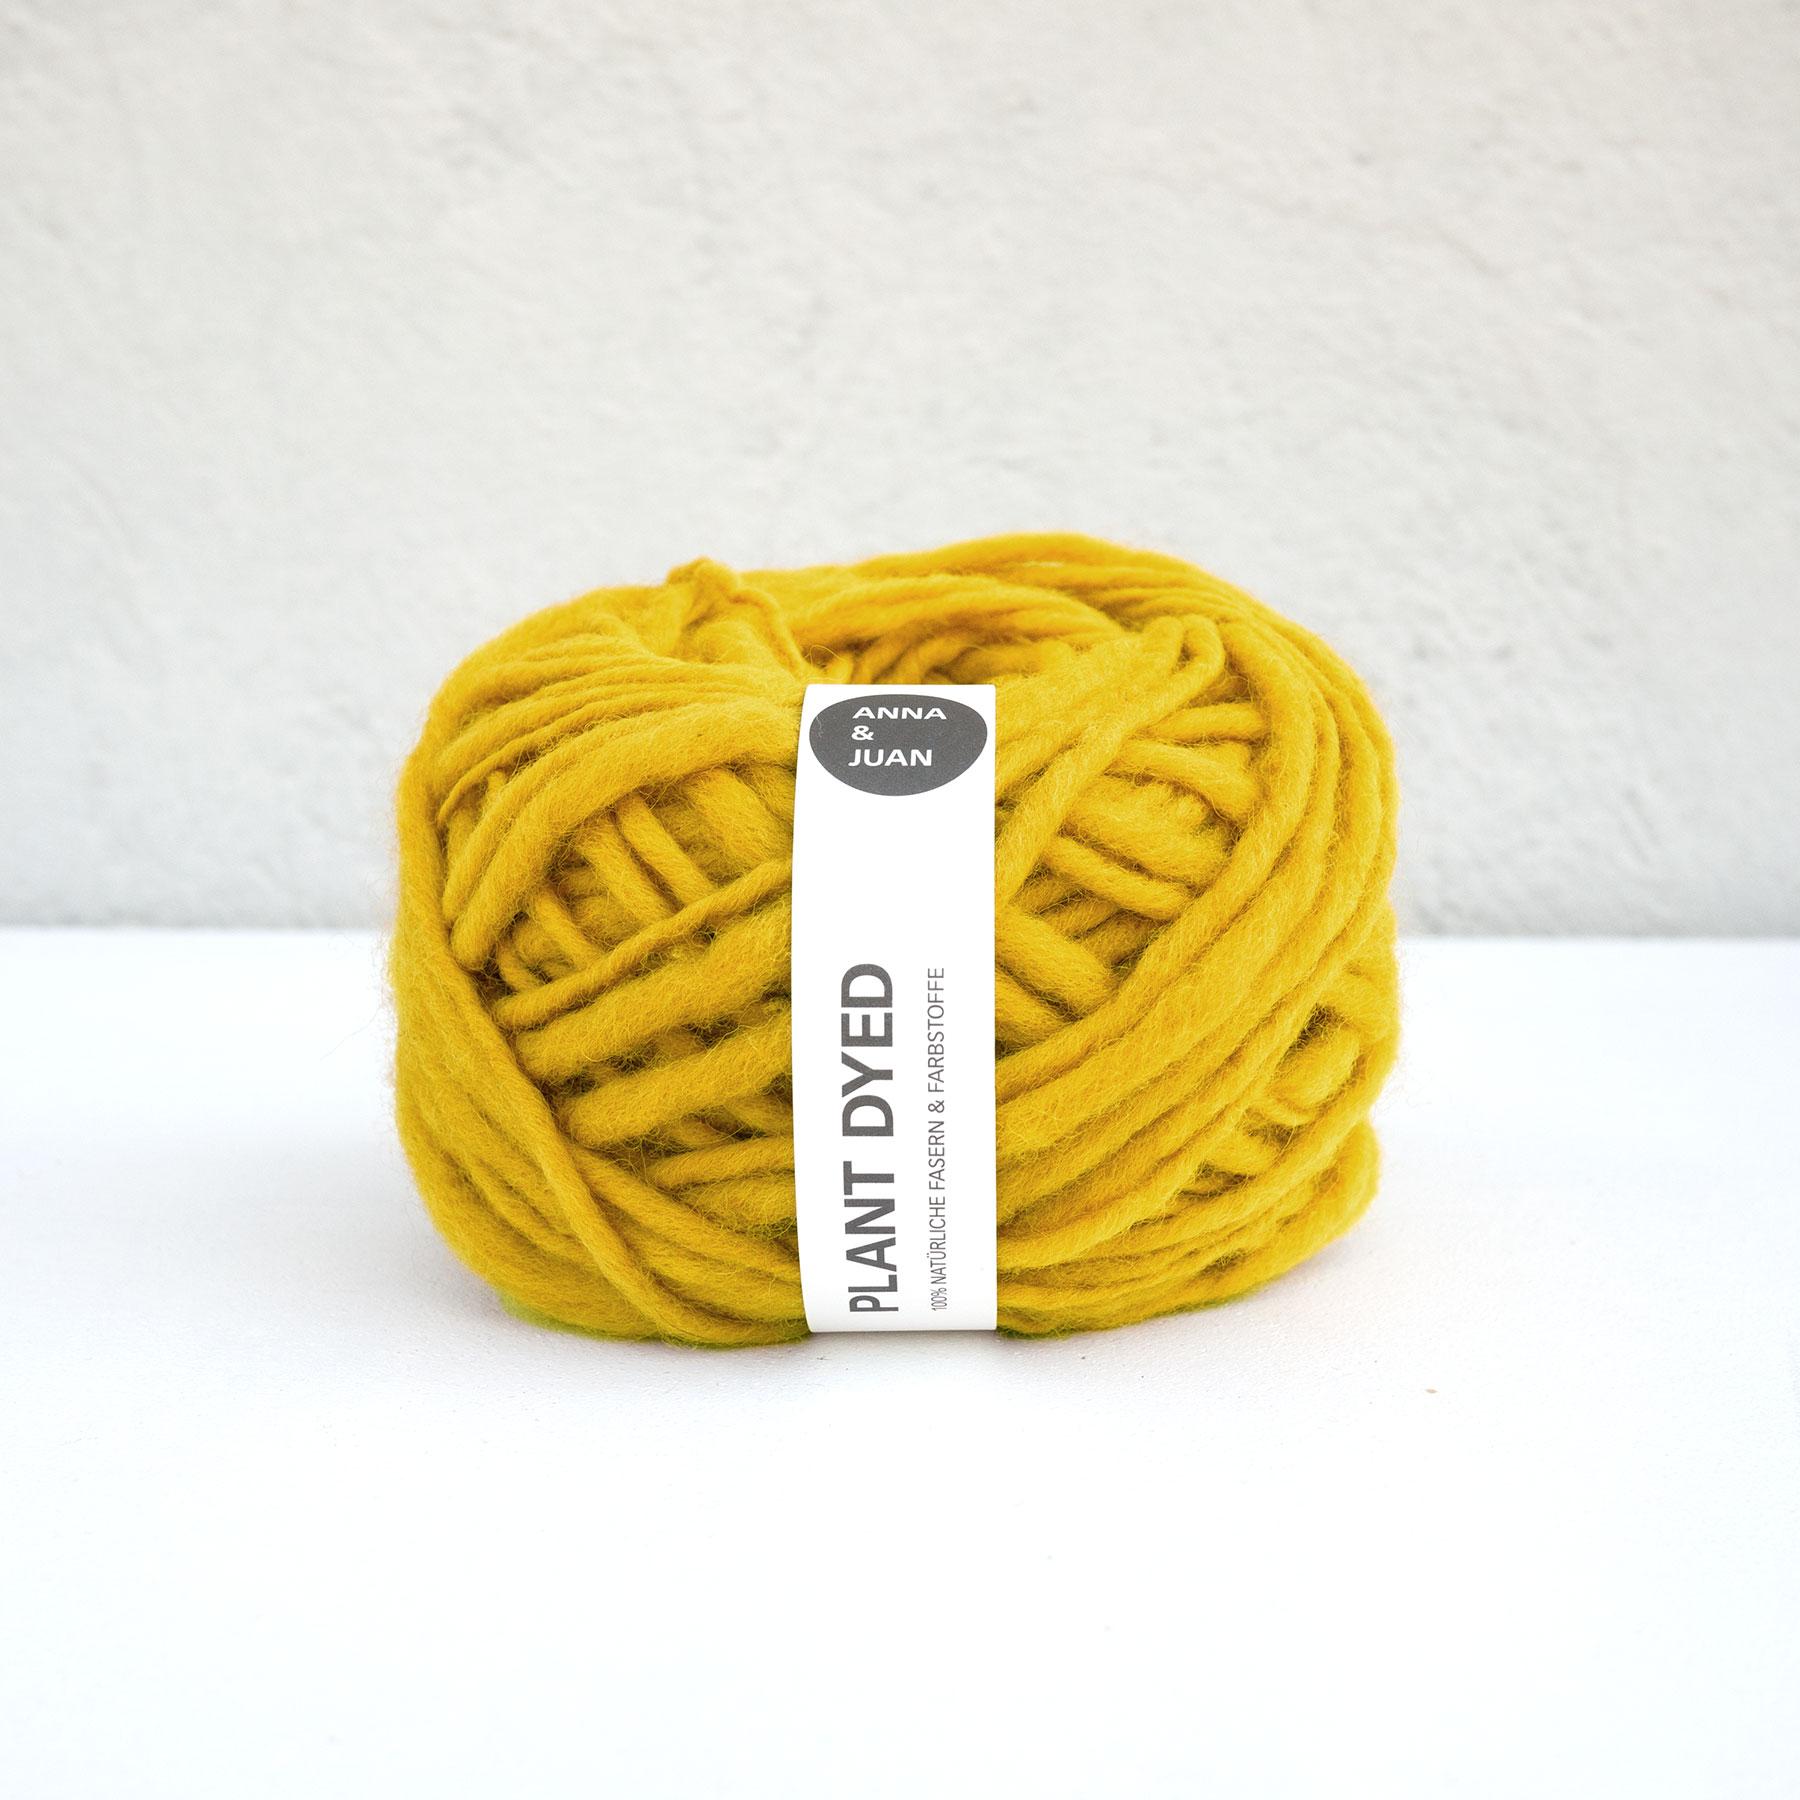 Anna & Juan Wolle «Plant Dyed» – Merino Handgesponnen – Super Bulky – Gelb